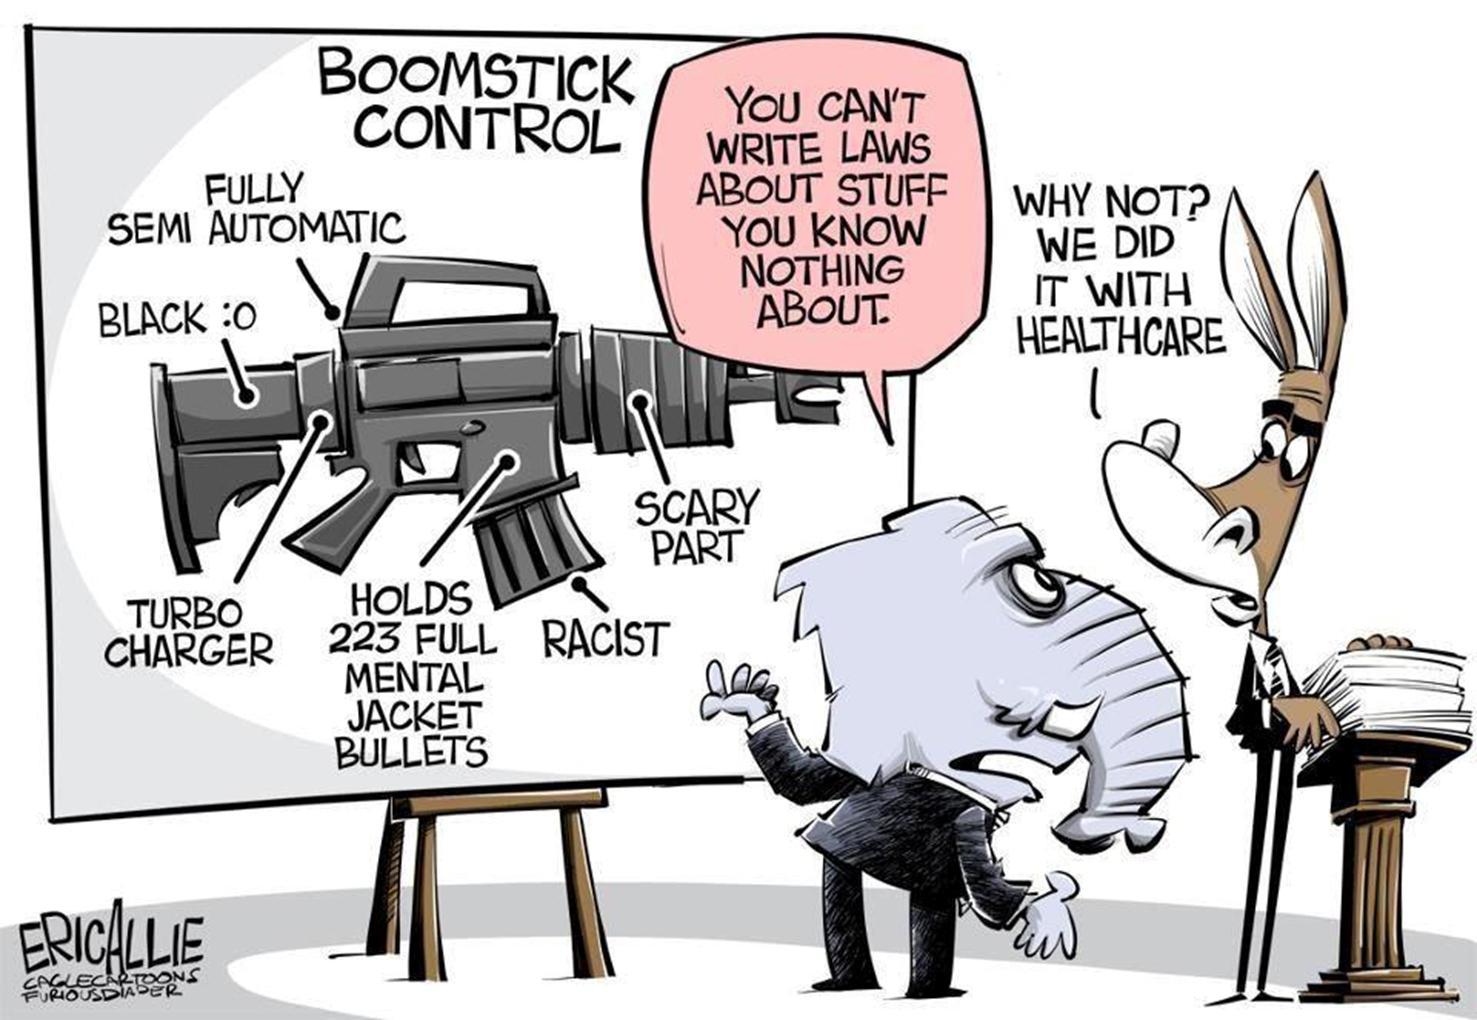 fun favorite cartoon images about gun control fun favorite cartoon images about gun control gun control cartoon jpg